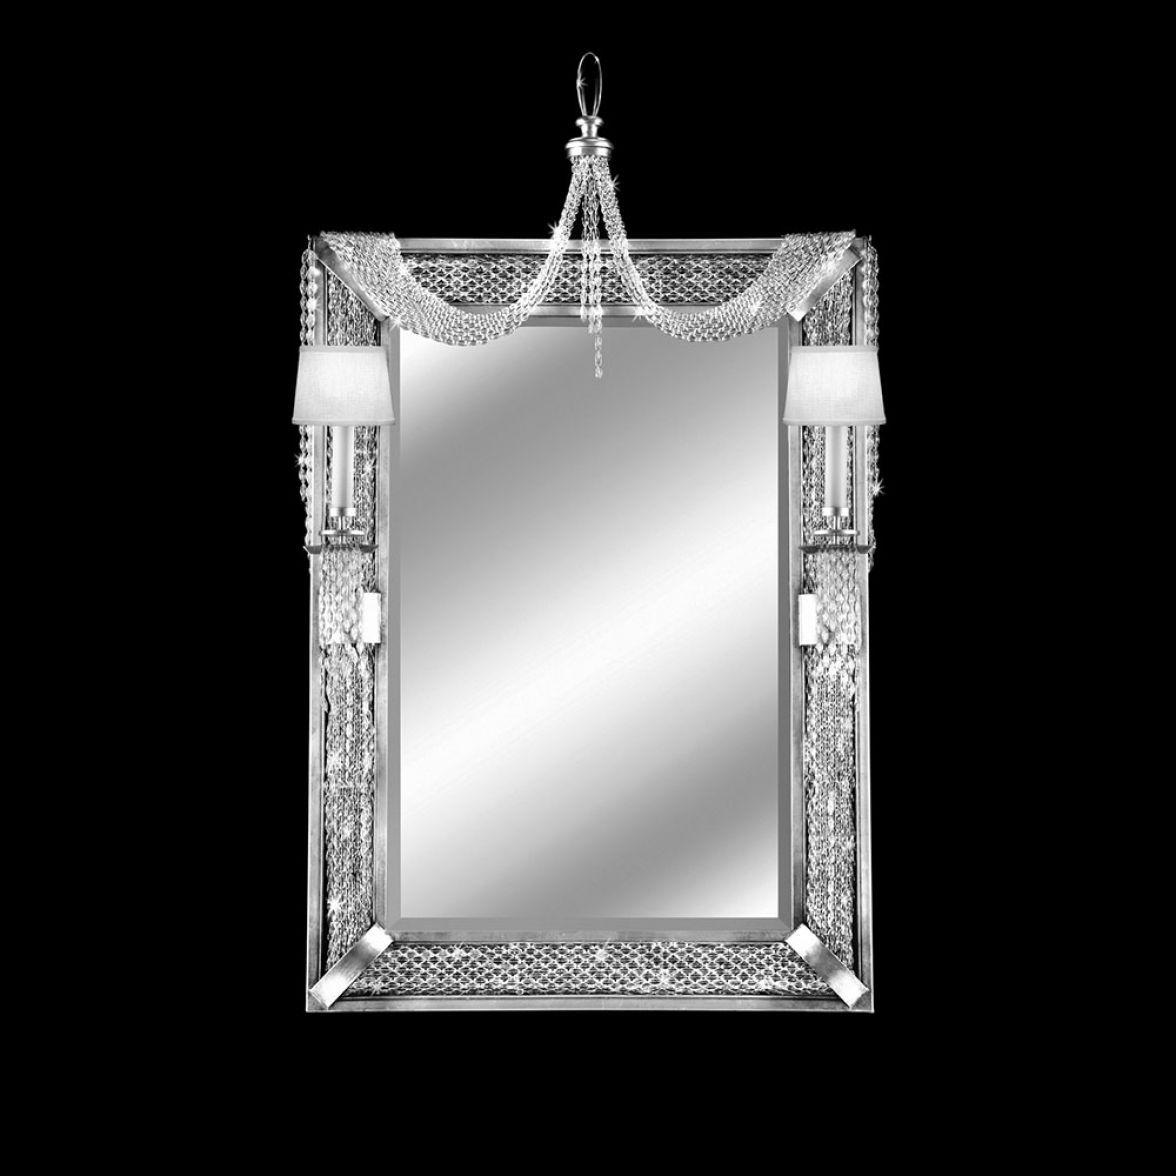 Cascades mirror фото цена